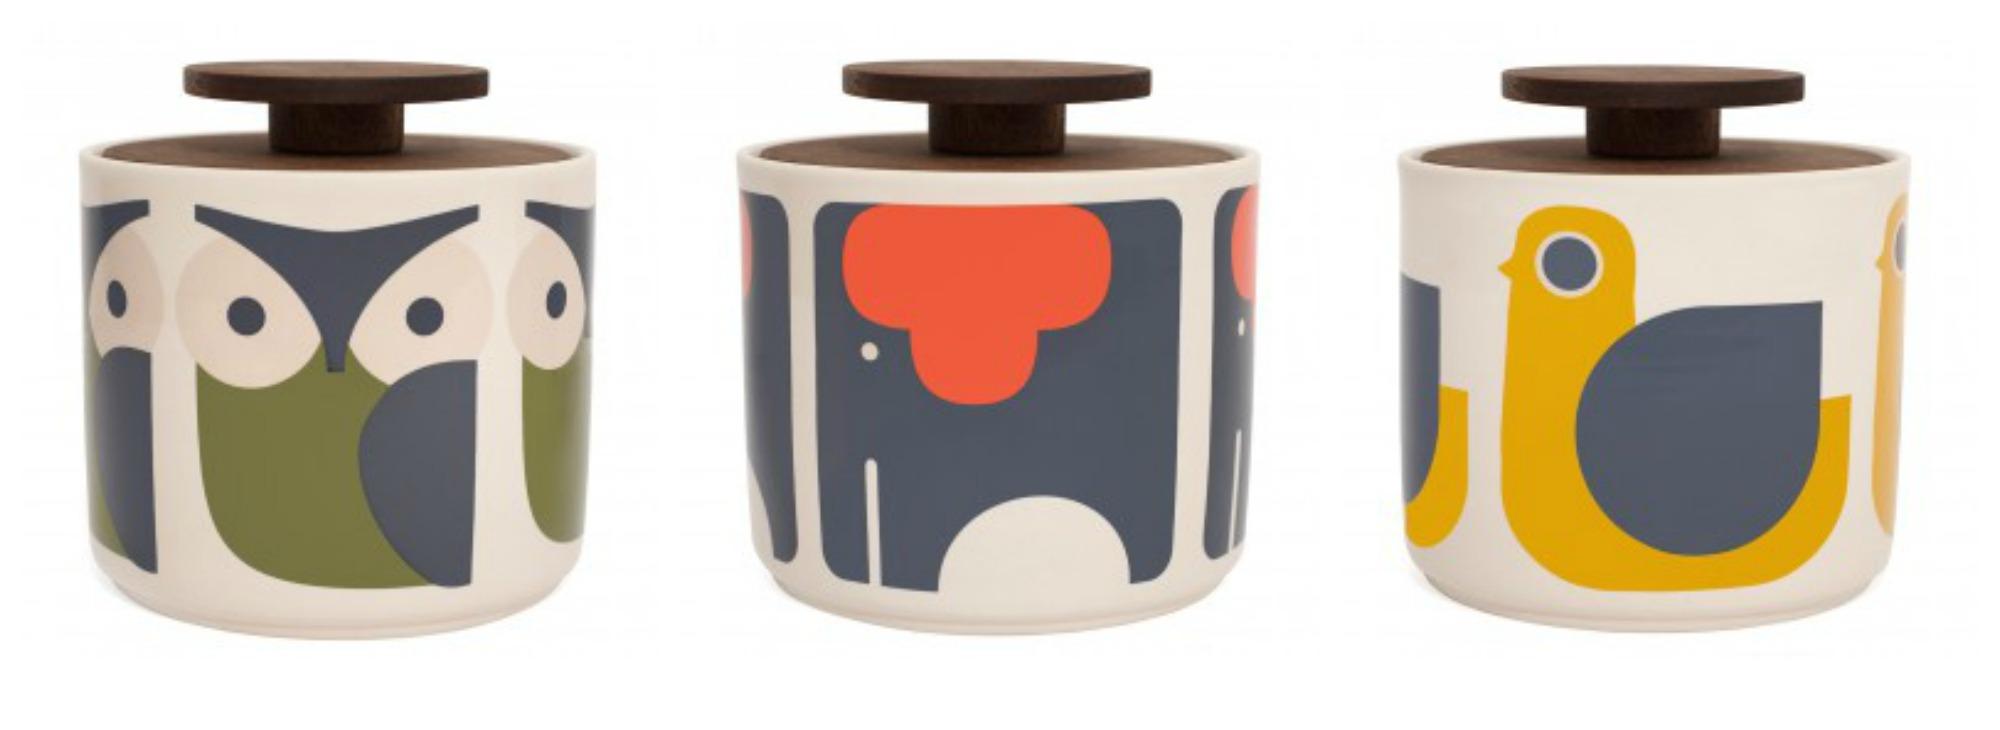 Orla Kiely Retro And Whimsical Animal Design Homeware Fresh Design